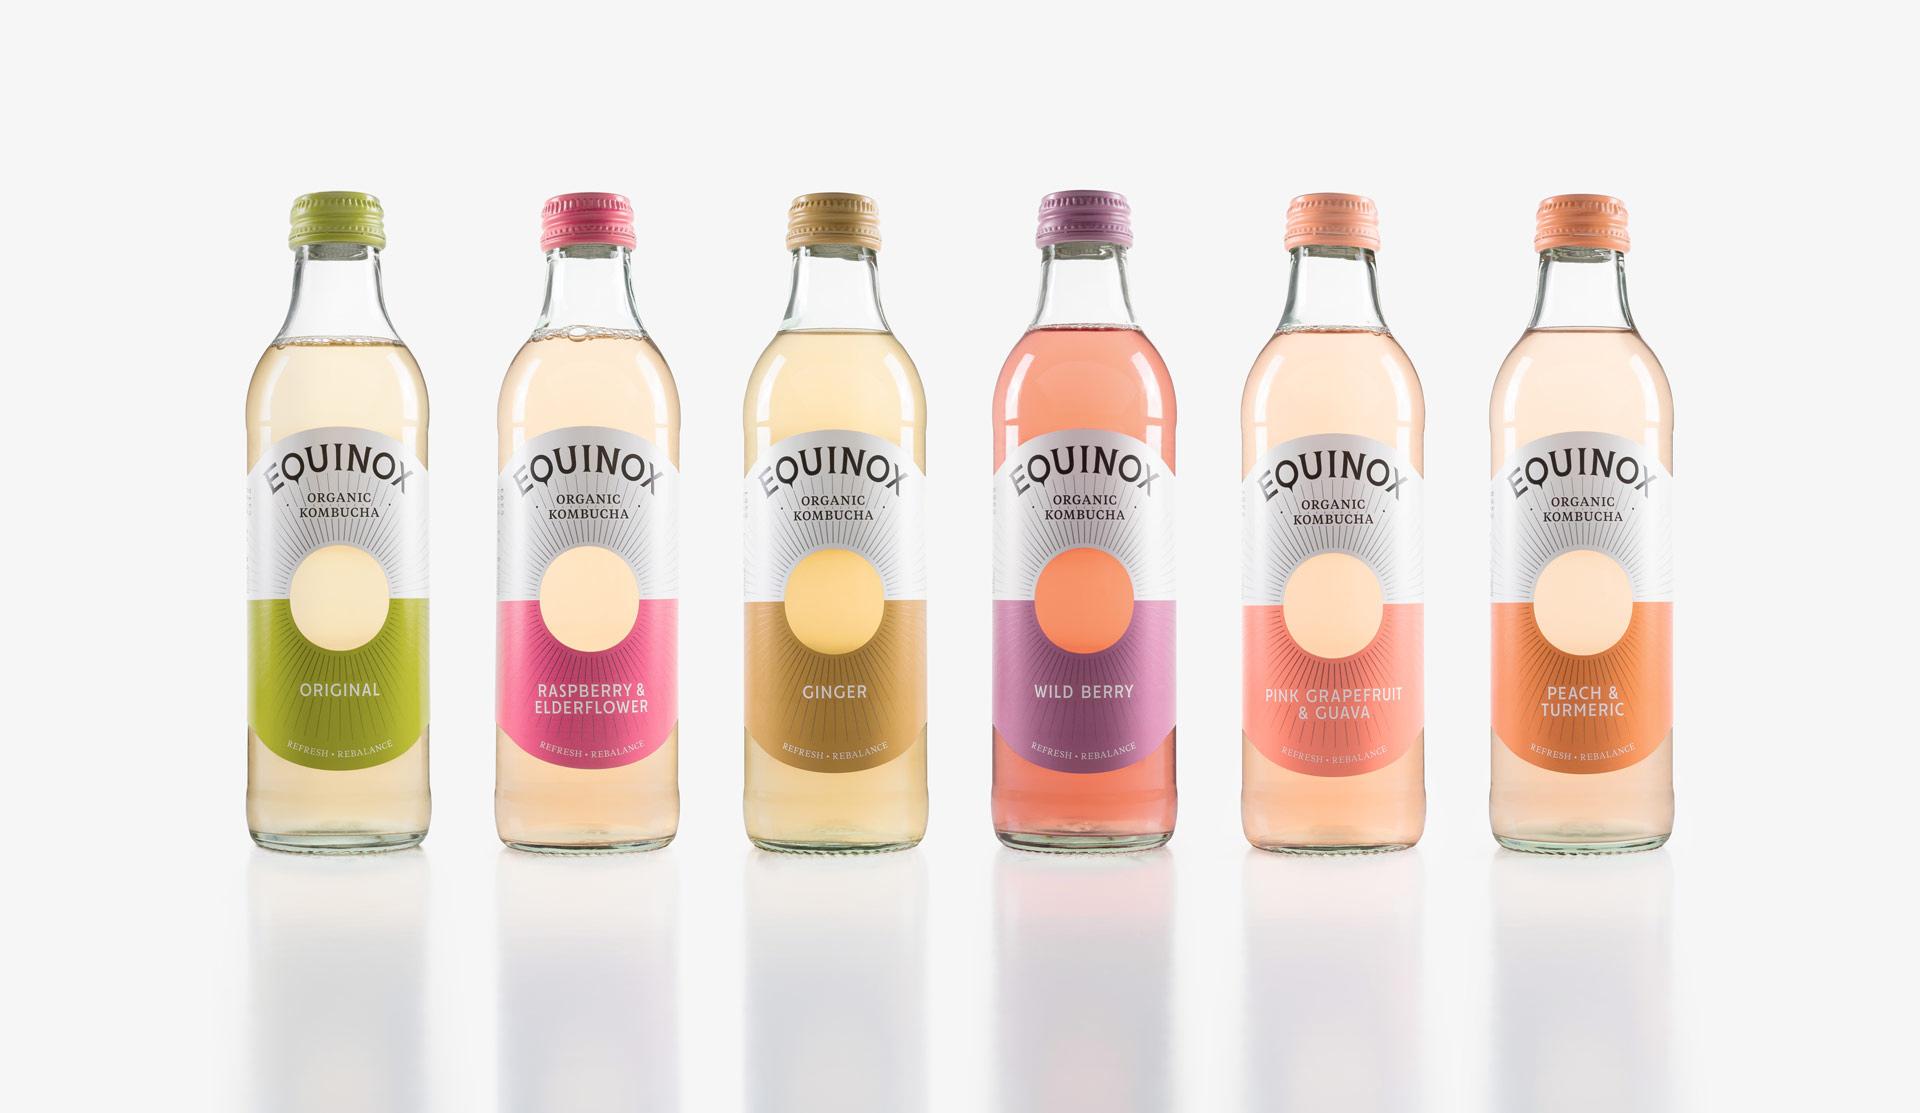 New Logo and Packaging for Equinox Organic Kombucha by Better